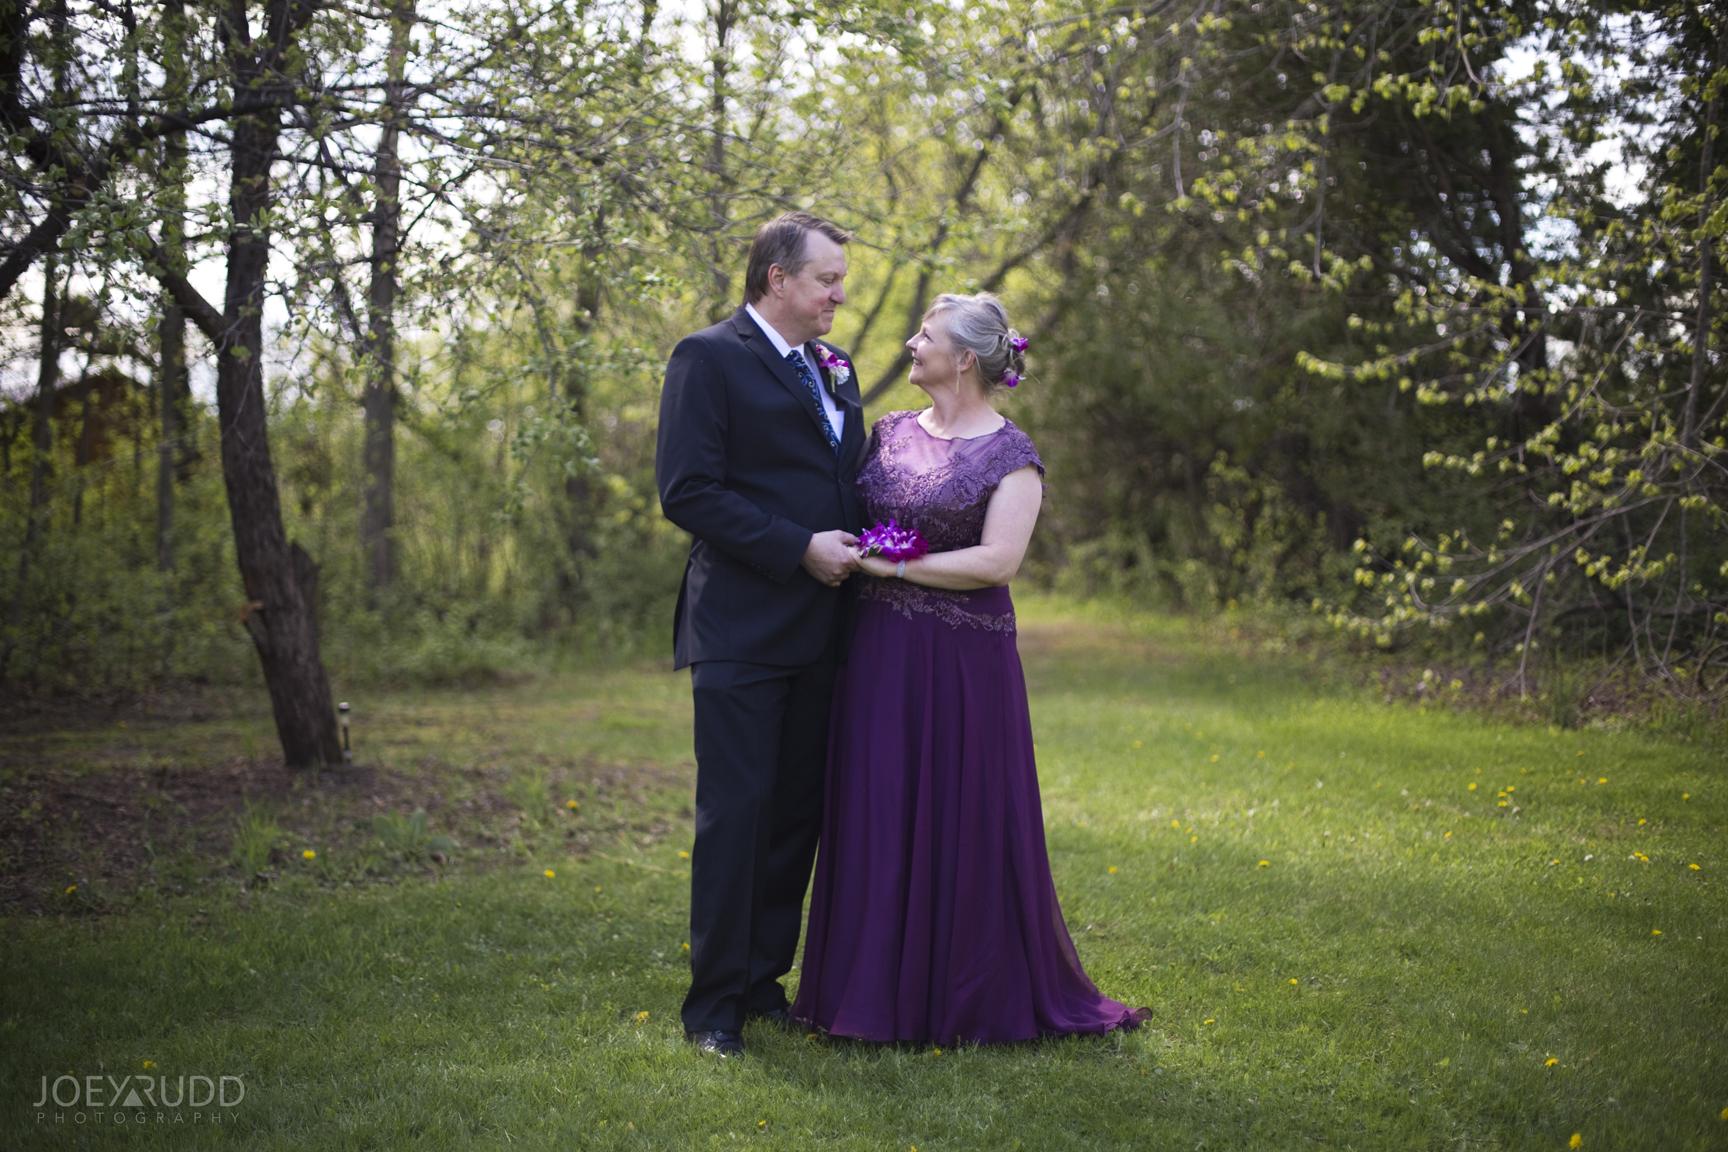 Elopement Session at Jabulani Vineyard by Joey Rudd Photography Ottawa Wedding Photographer Couple